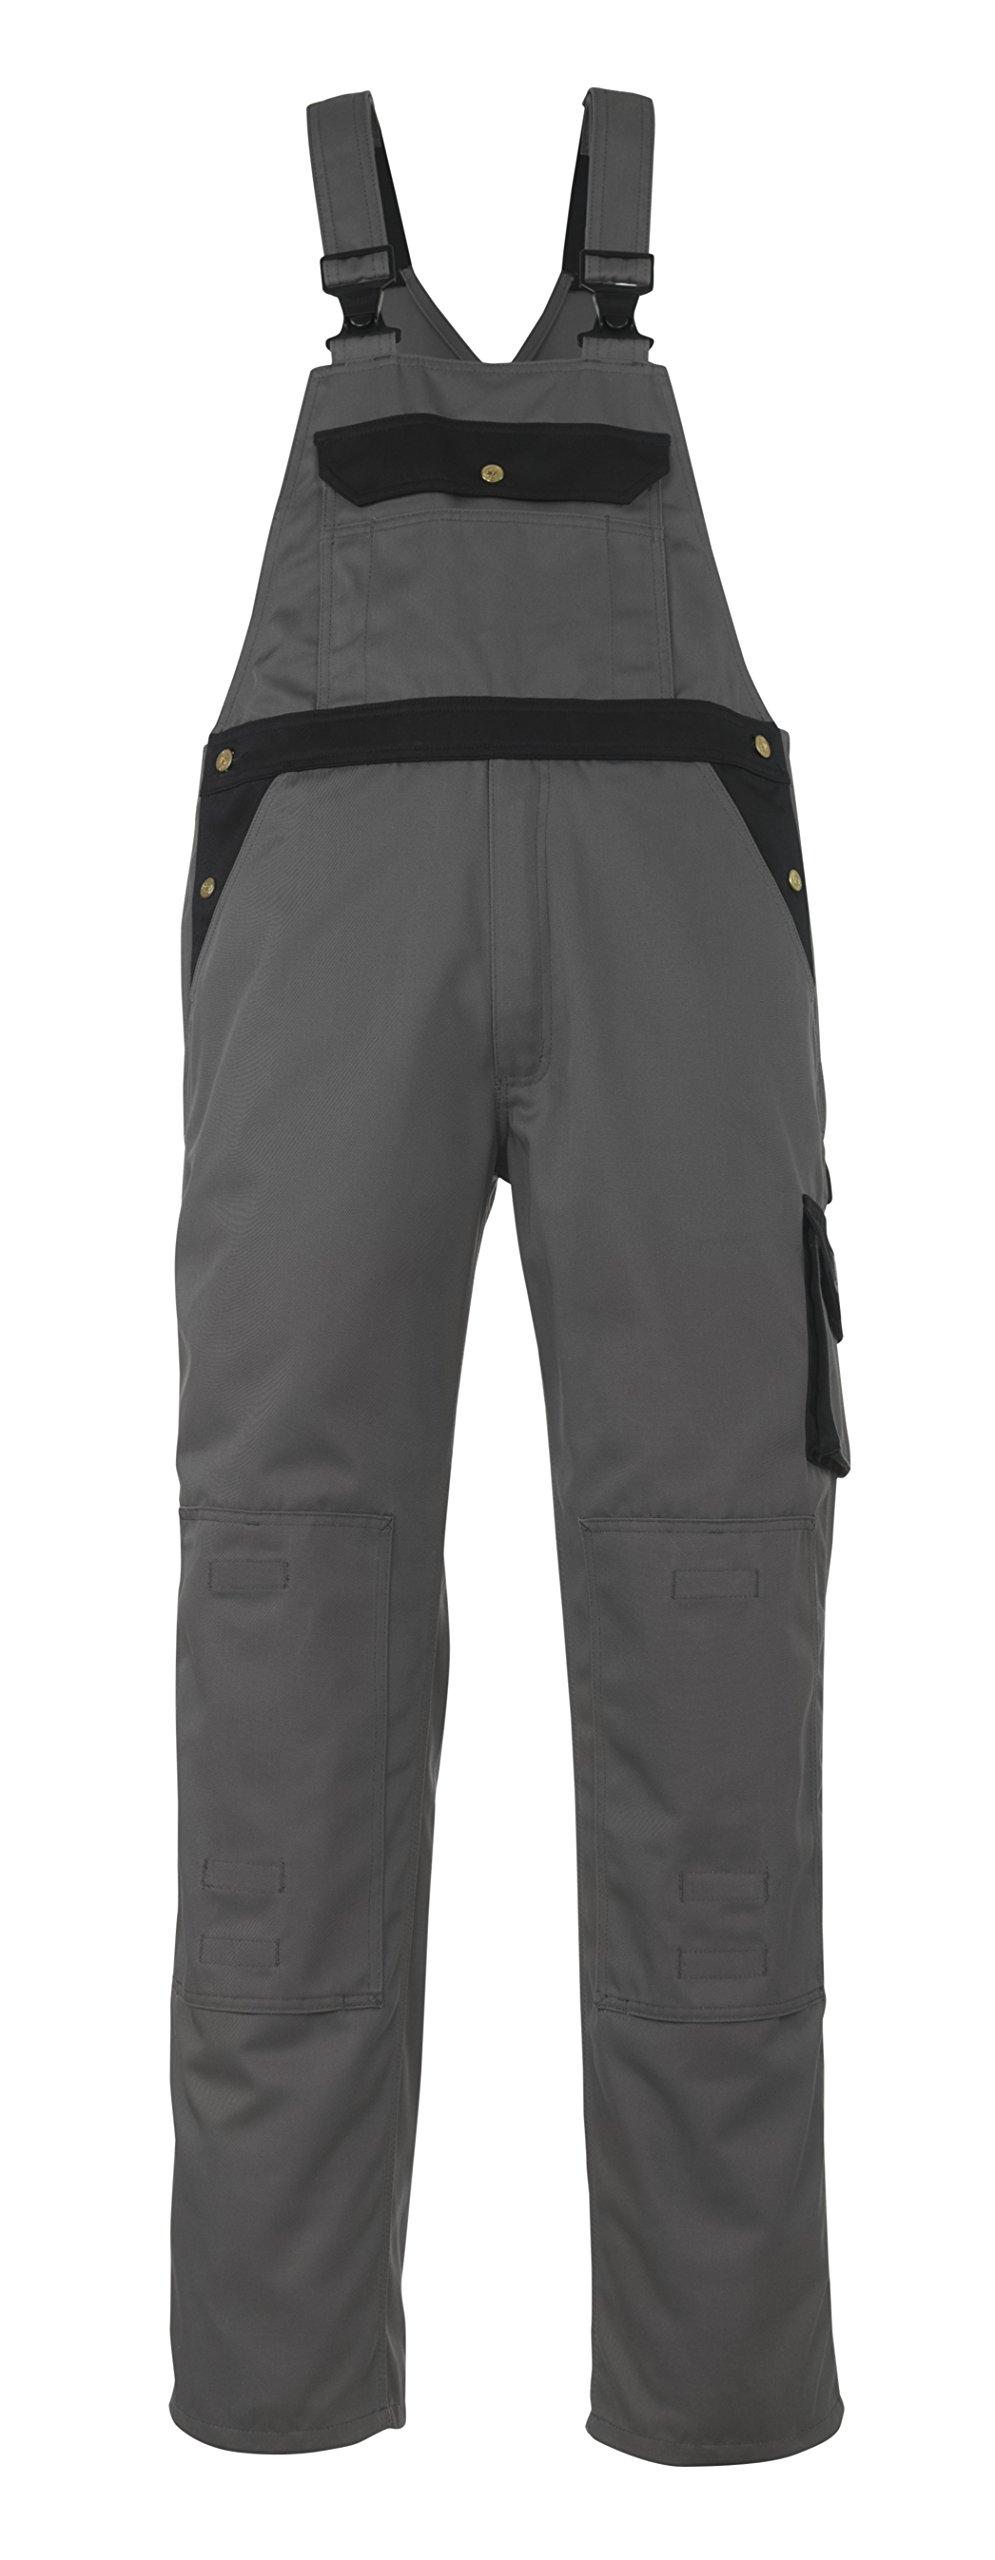 Mascot 00969-430-8889-90C48''Milano'' Bib & Brace Overalls, L90cm/C48, Anthracite/Black